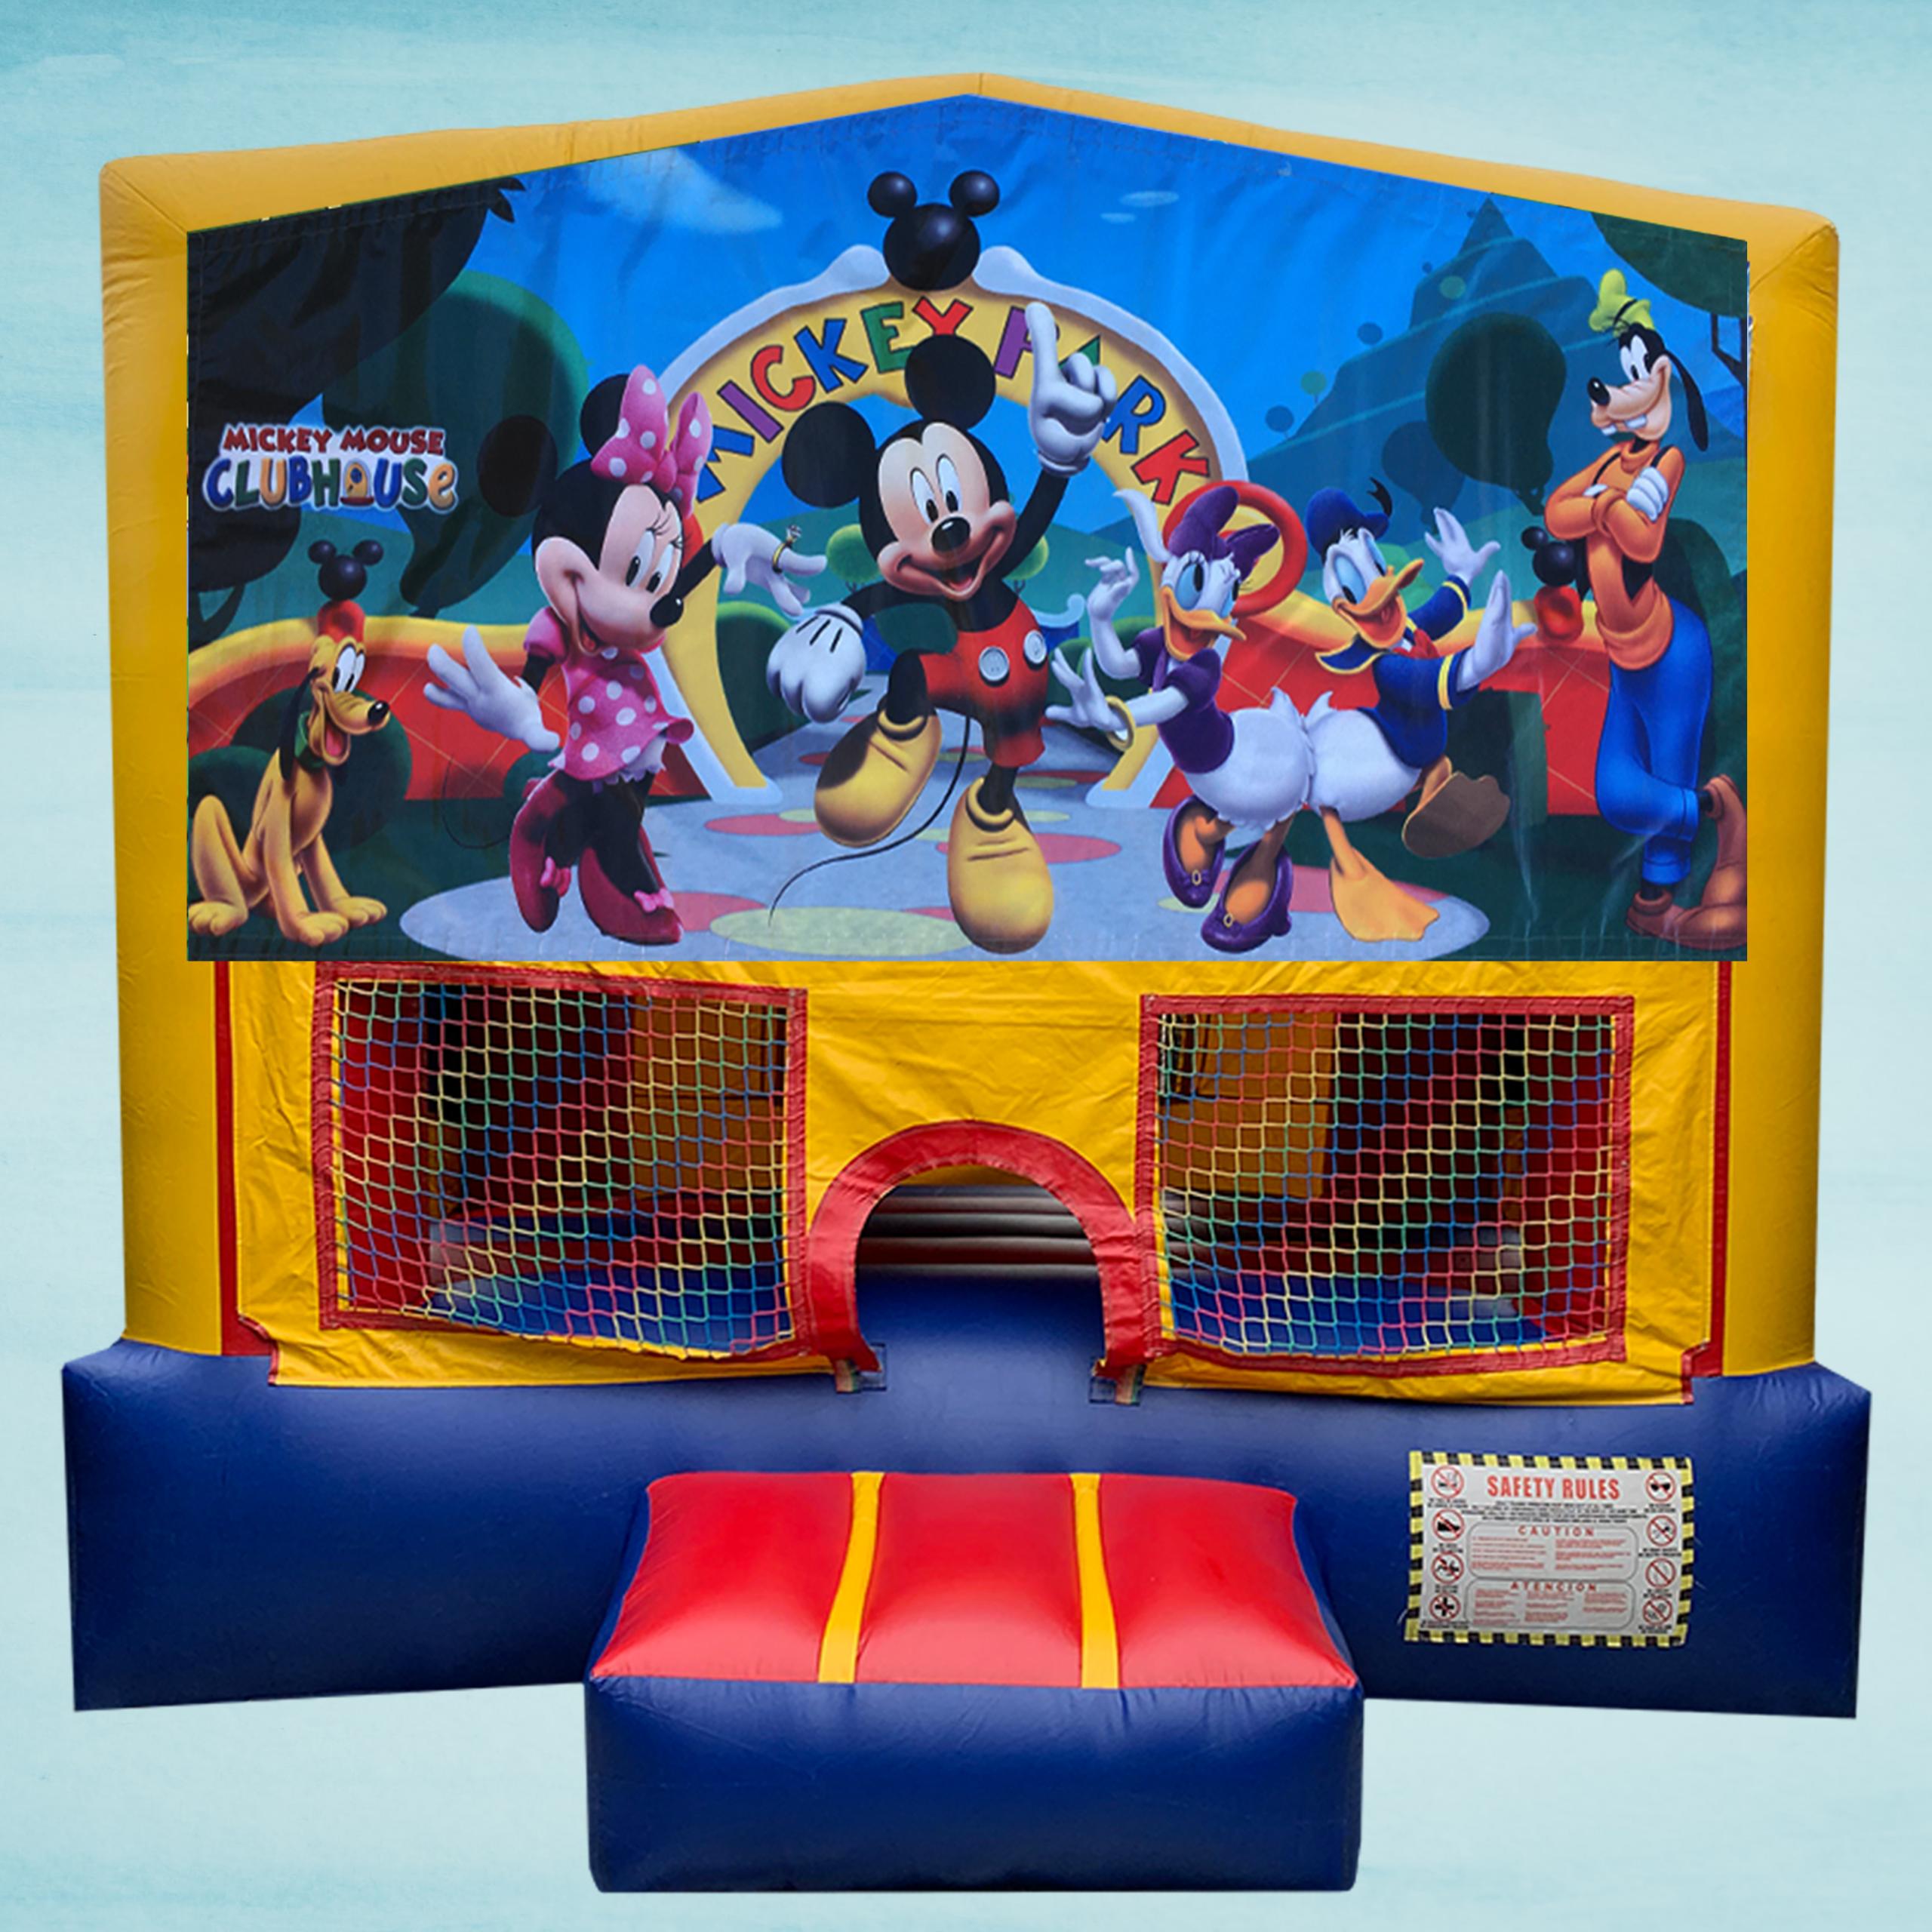 Mickey Mouse Club House Bounce House